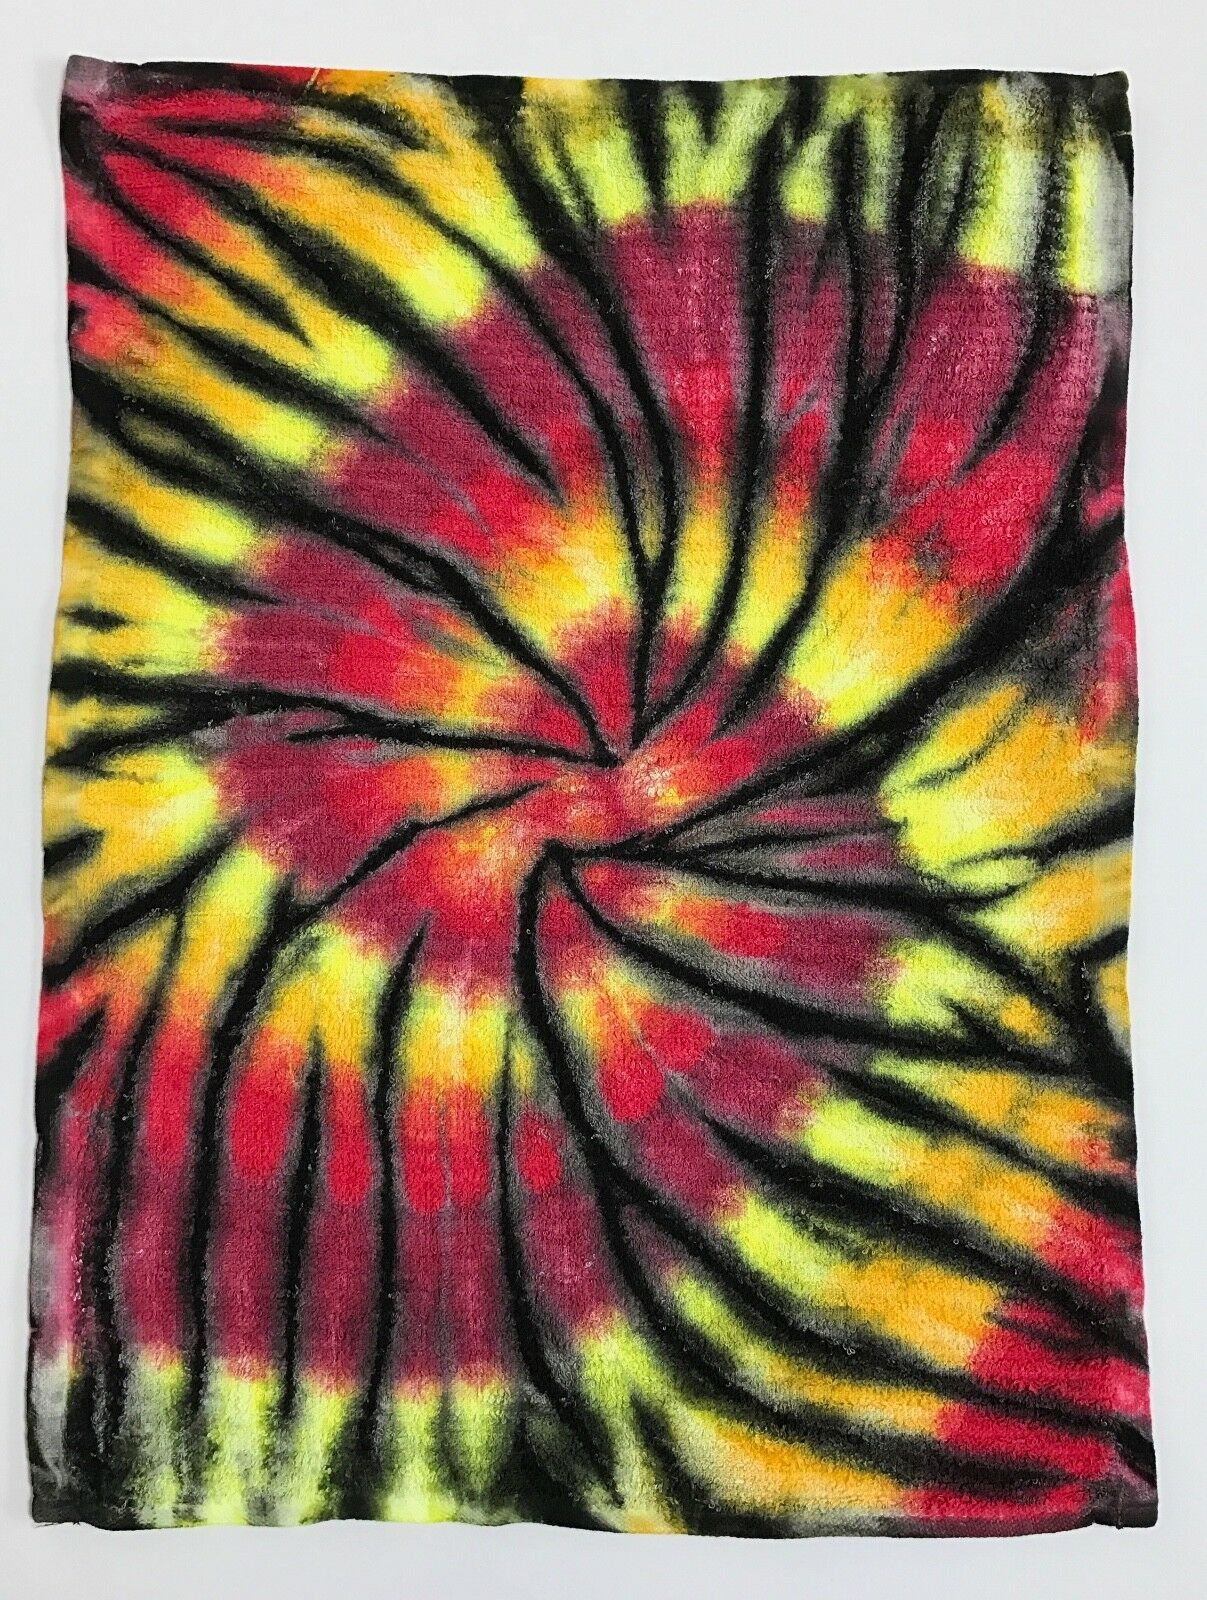 *New* Handmade Tie Dye Tiger's Eye Washcloth, Hand, Bath Towel, Single or Set